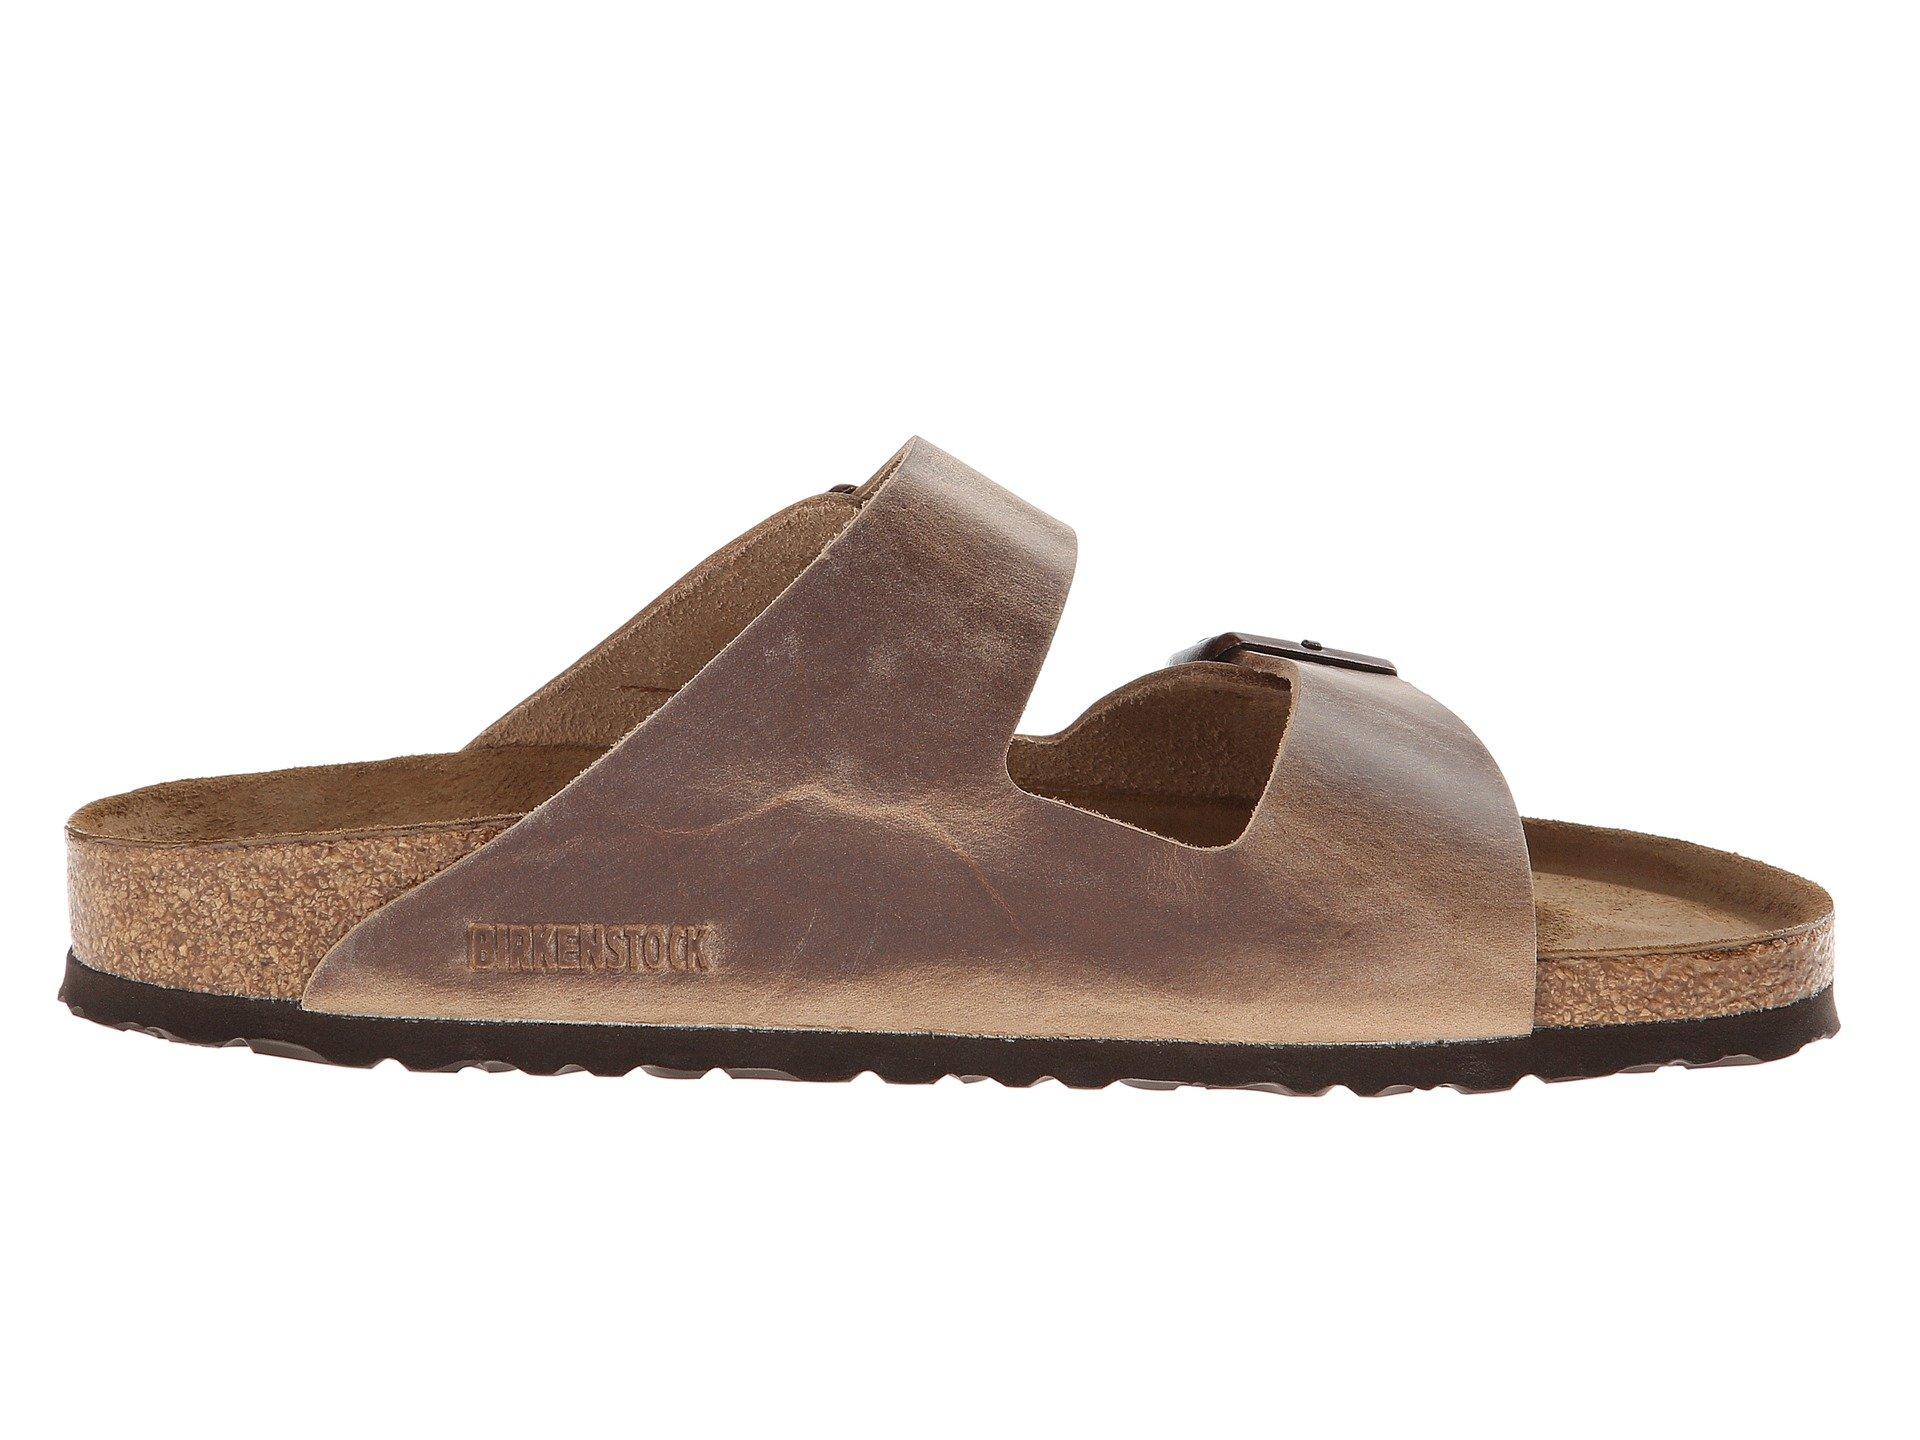 Birkenstock Arizona Soft Footbed - Leather (Unisex) at Zappos.com